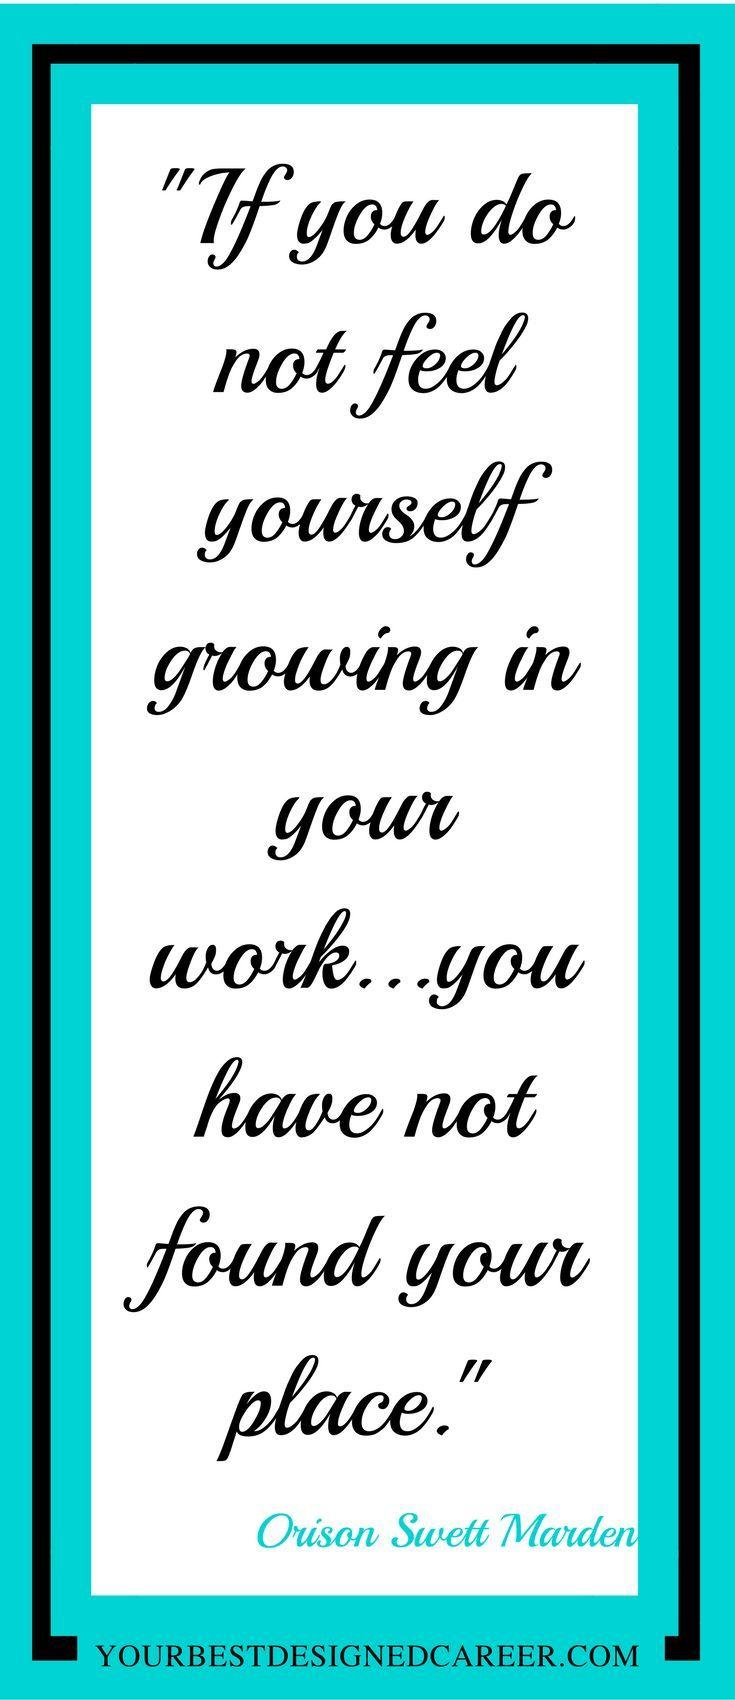 Career Career Advice Career Change Job Change Dream Job Inspirational Quote Quote Inspiration Care Job Quotes Career Quotes Motivational Quotes For Job